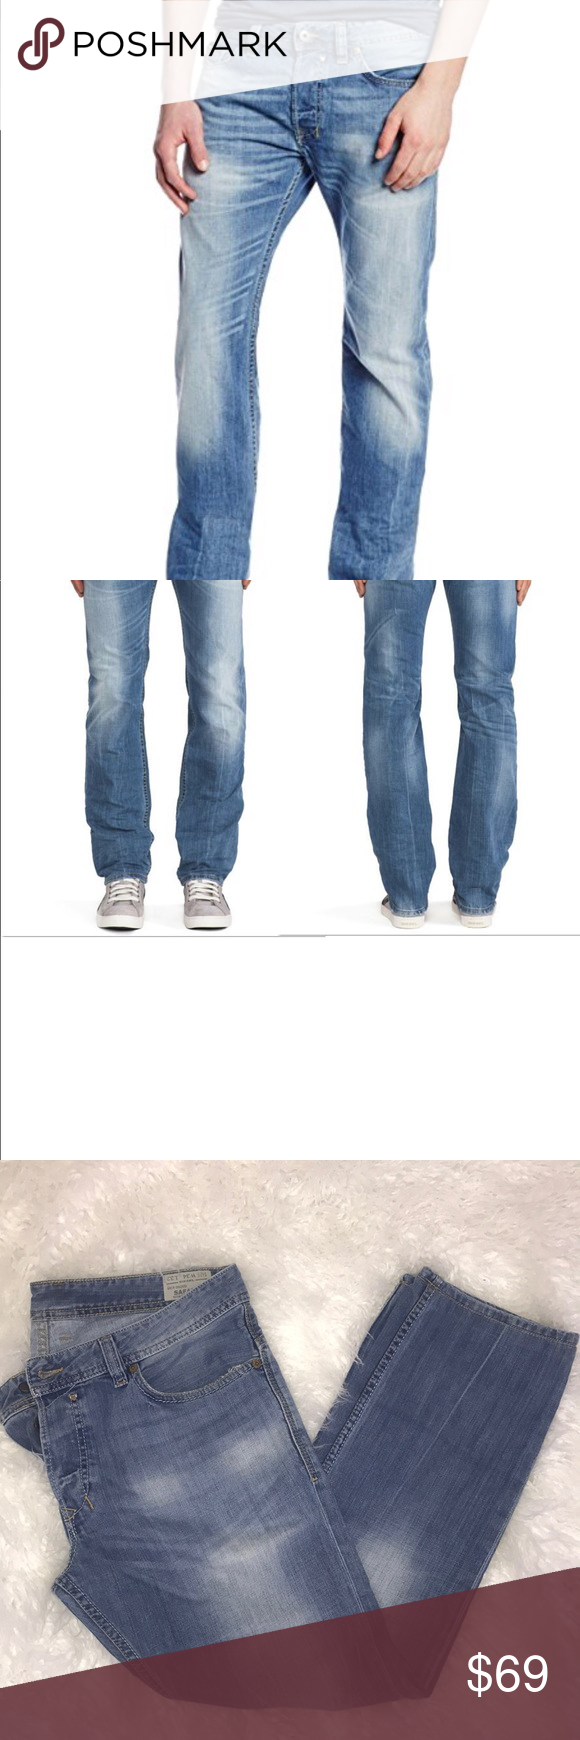 97925c91 Diesel Safari Reg. Slim Straight Diesel Safado Jeans. These are in light  wash 0826D